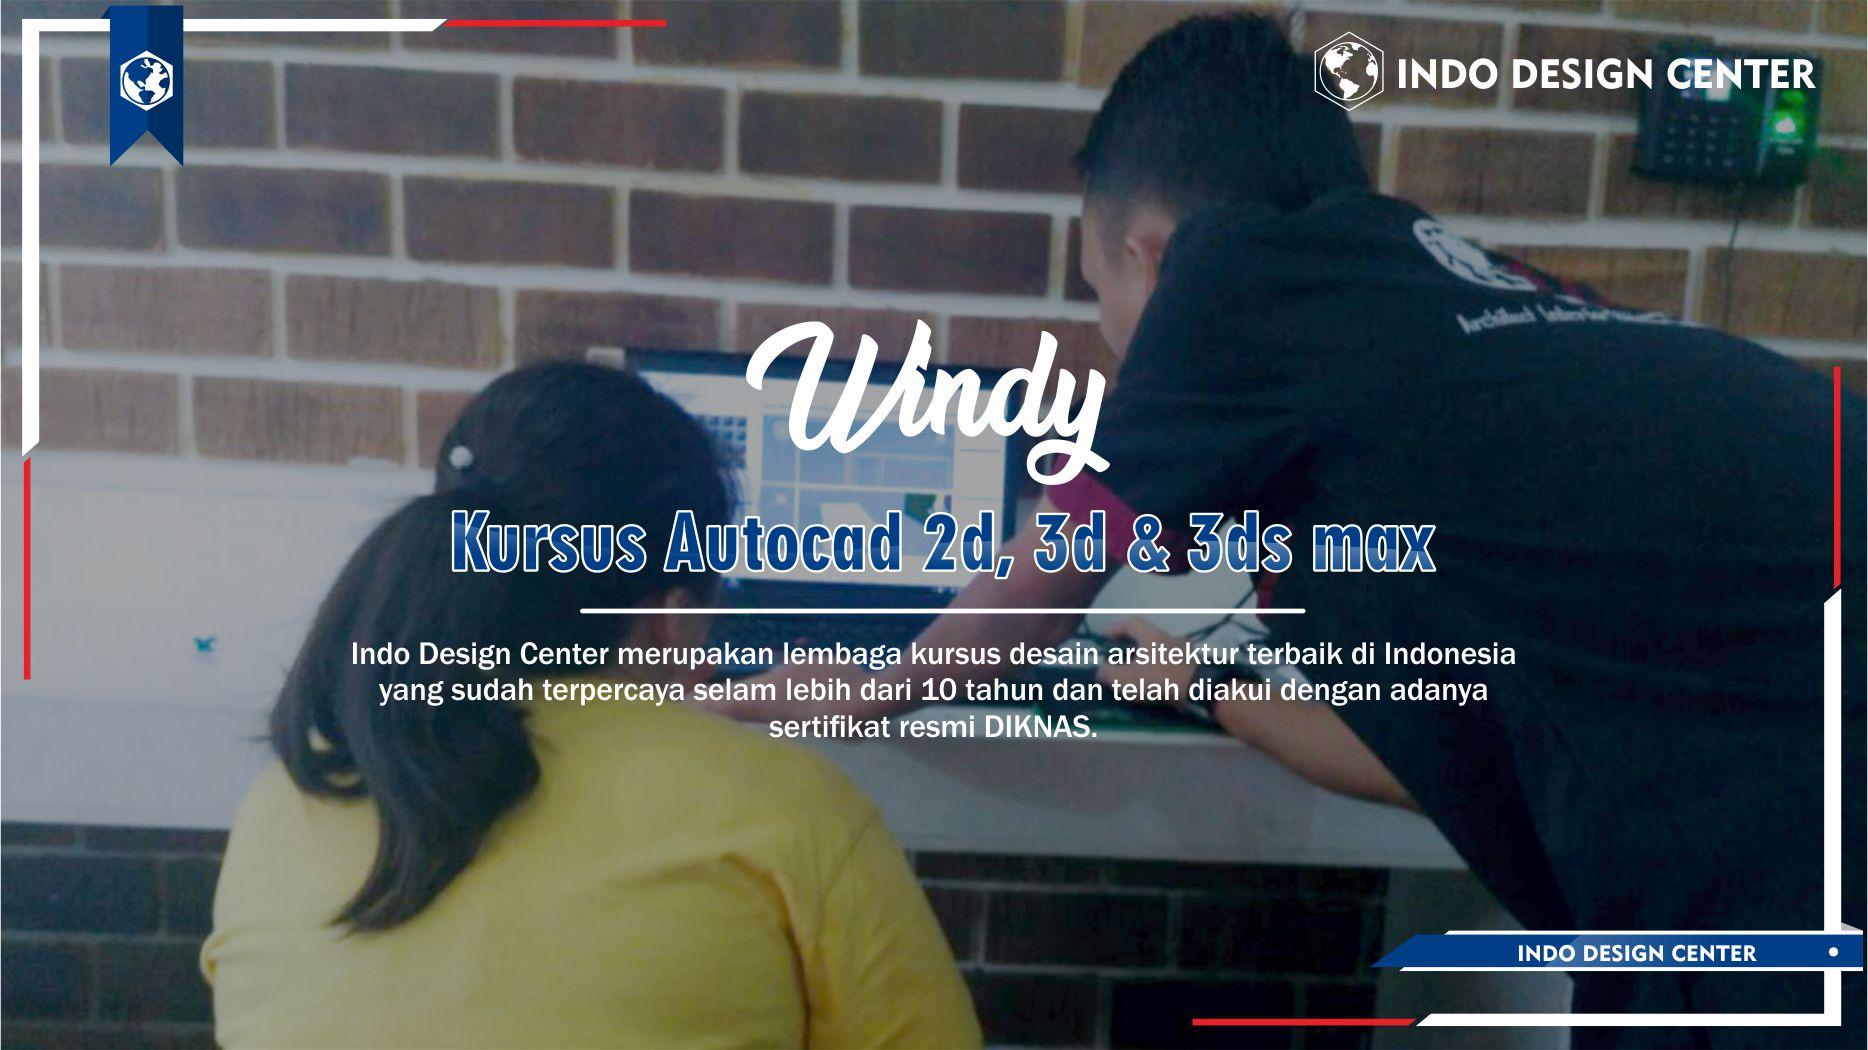 Kursus Autocad 2D, 3D & 3ds Max Tambora Jakarta Barat Windy